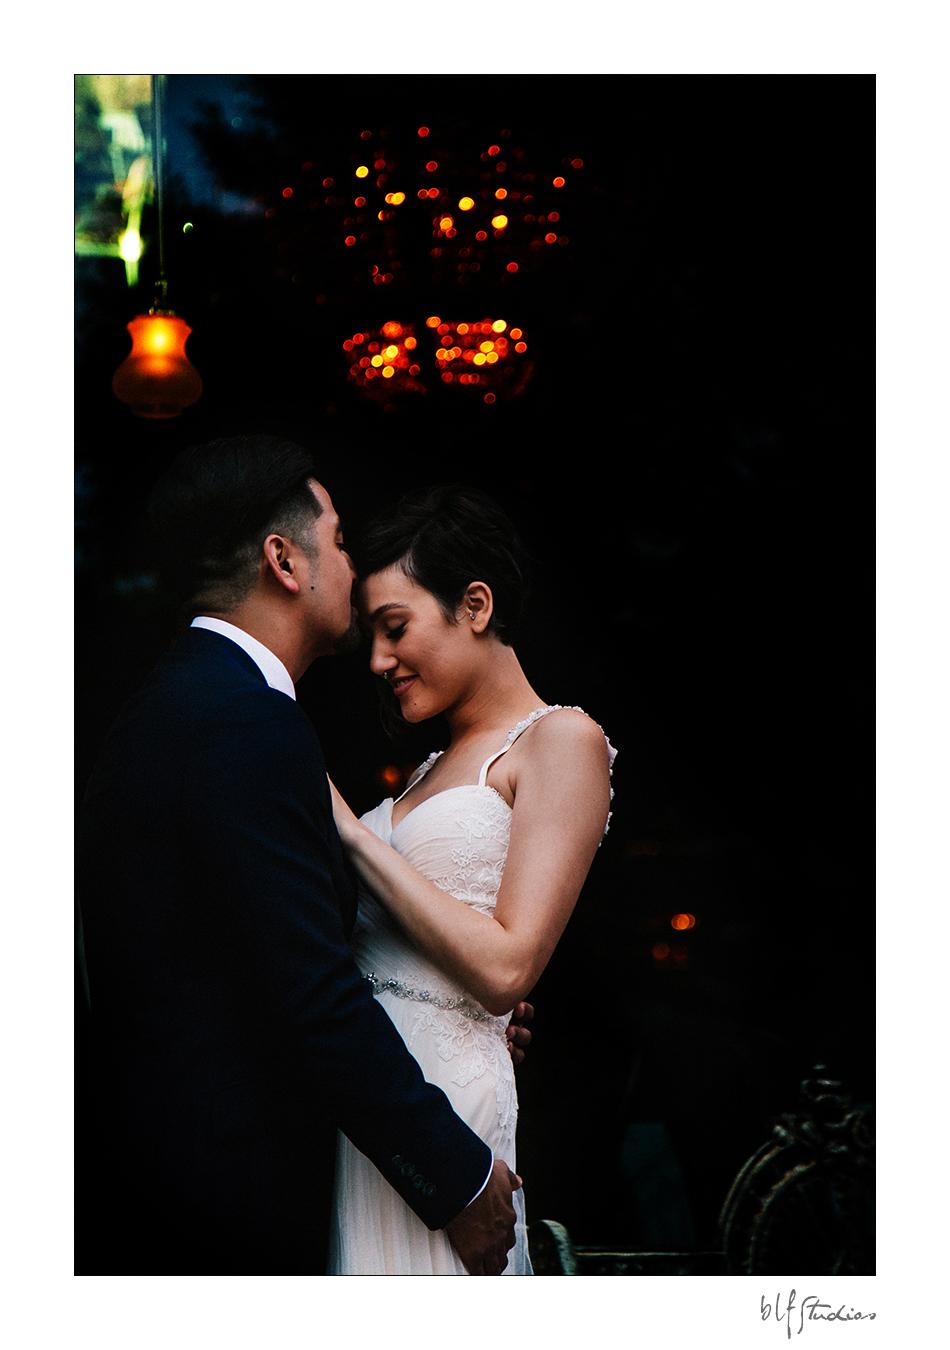 0026-blfstudios-wedding-photographer-daniel-danielle-atlanta.jpg